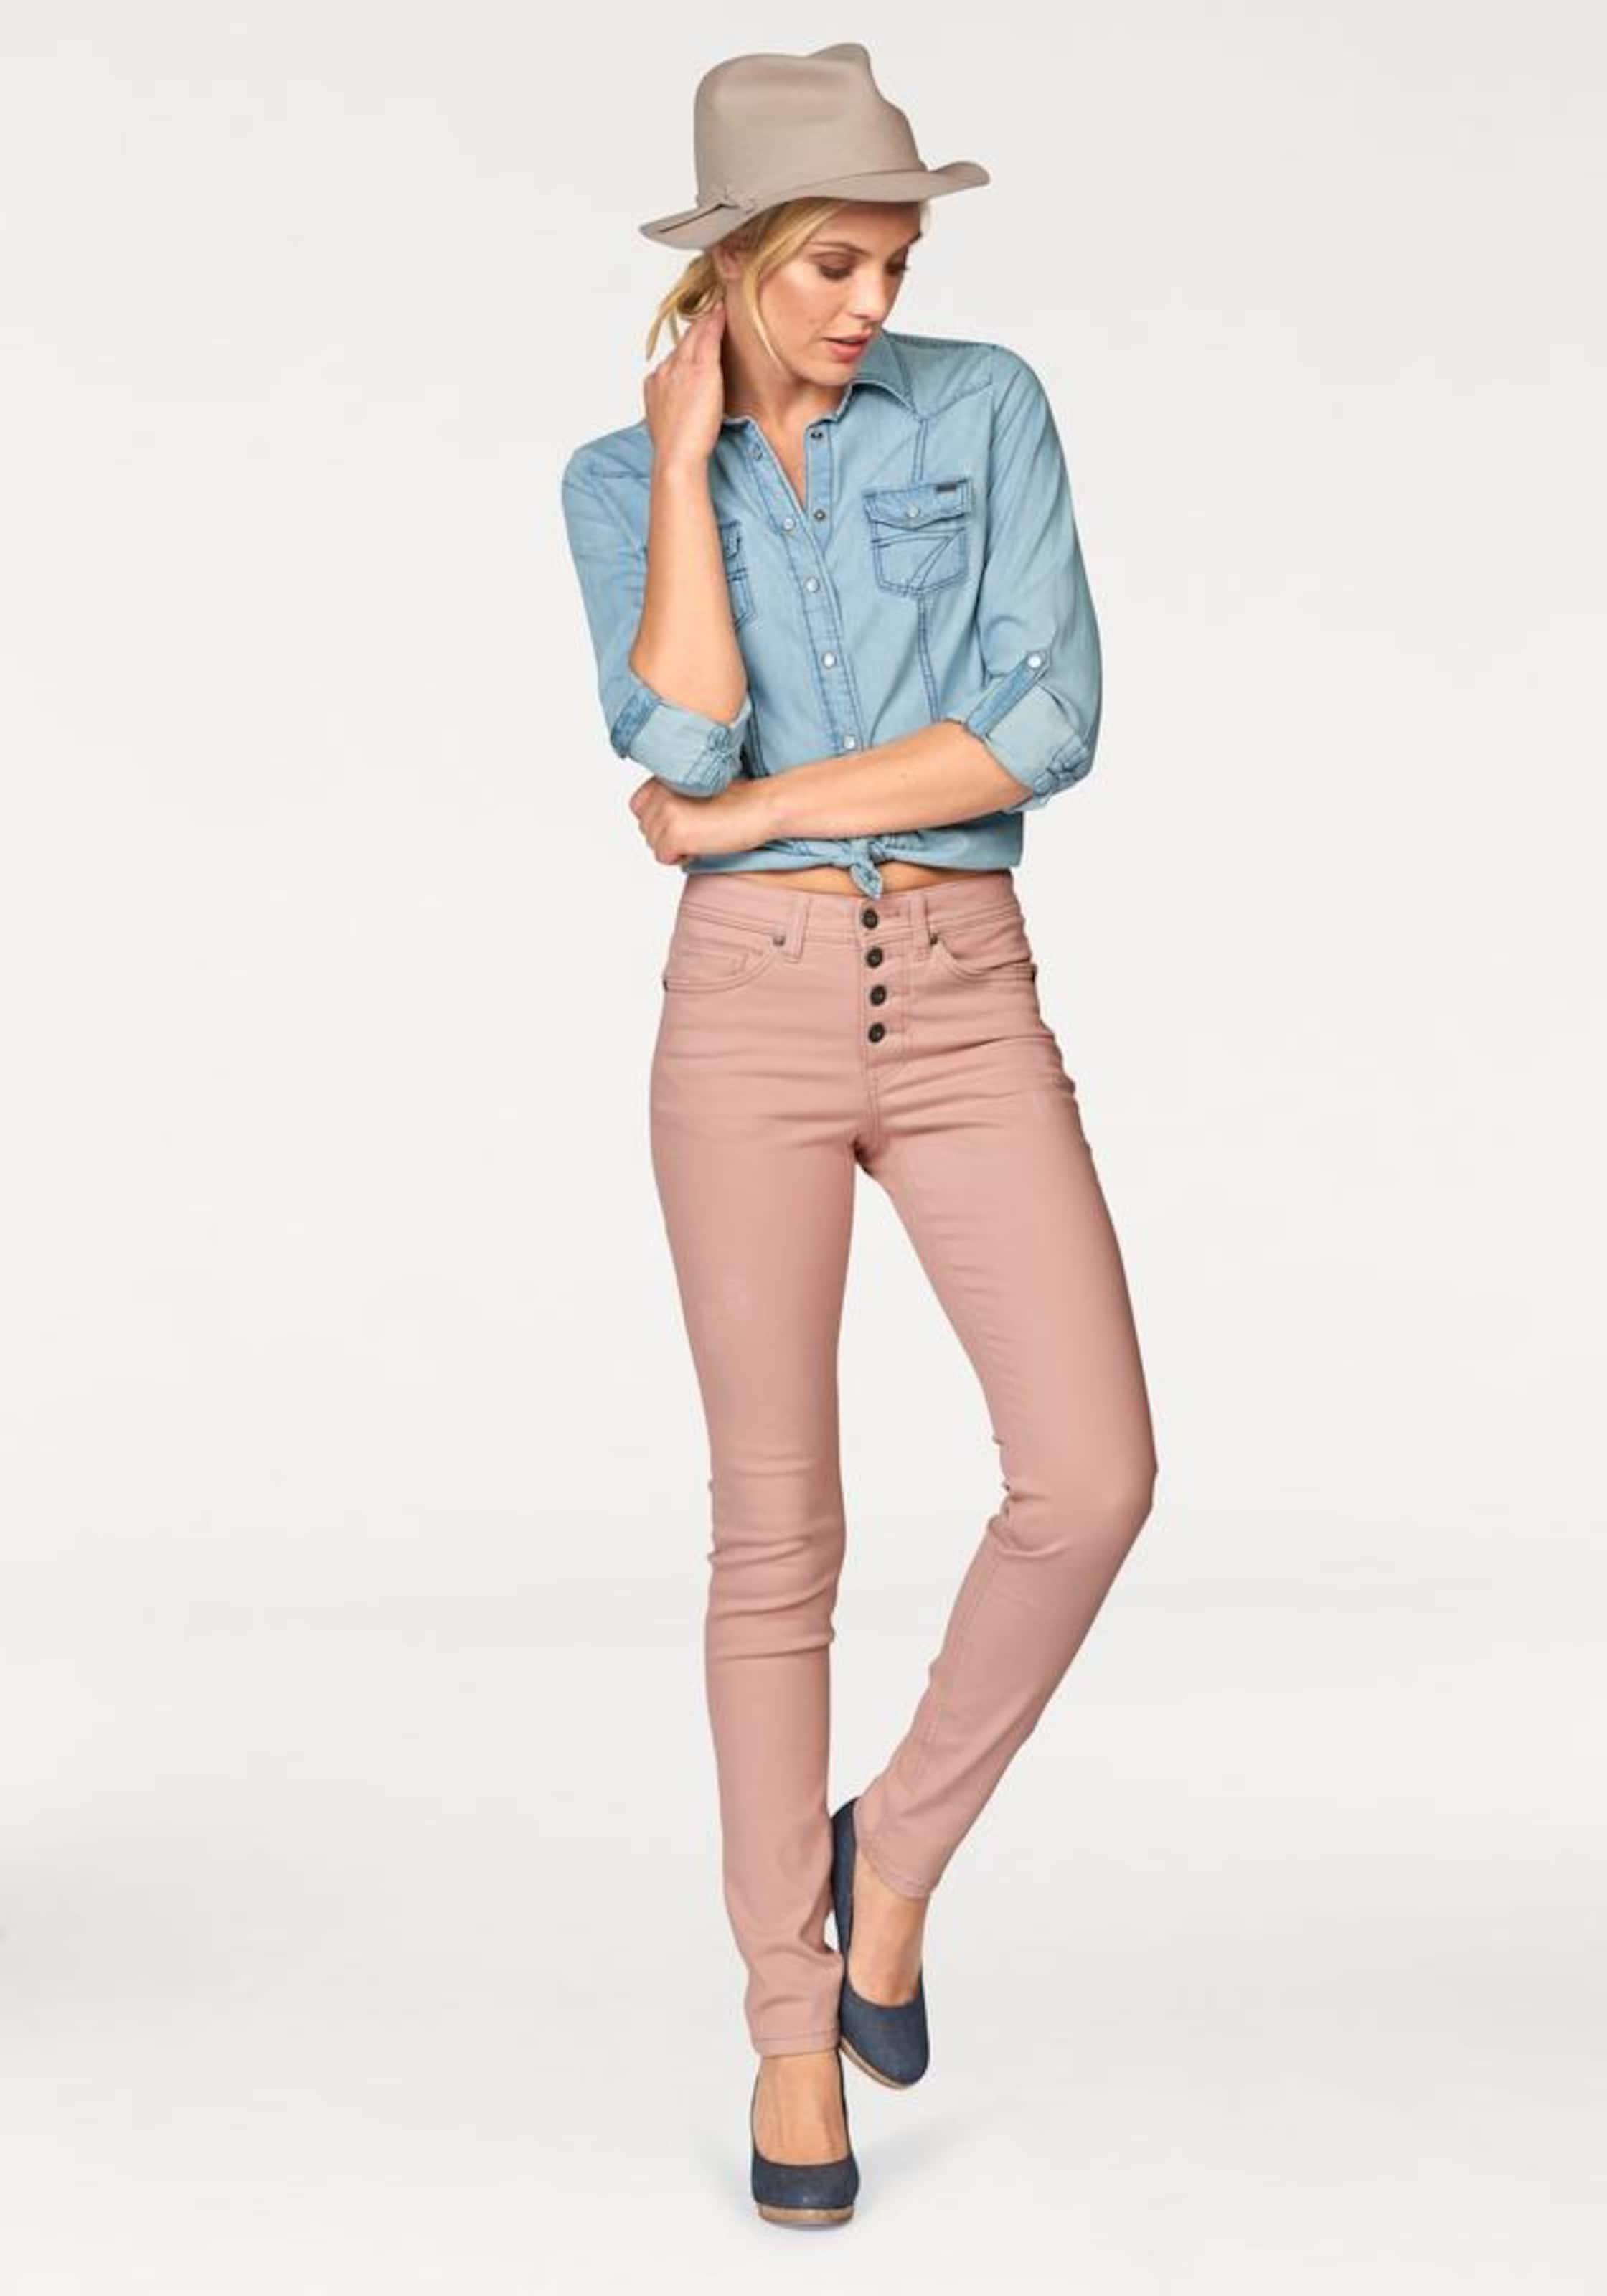 Puder Jeans Jeans Arizona In Arizona mw8Nn0